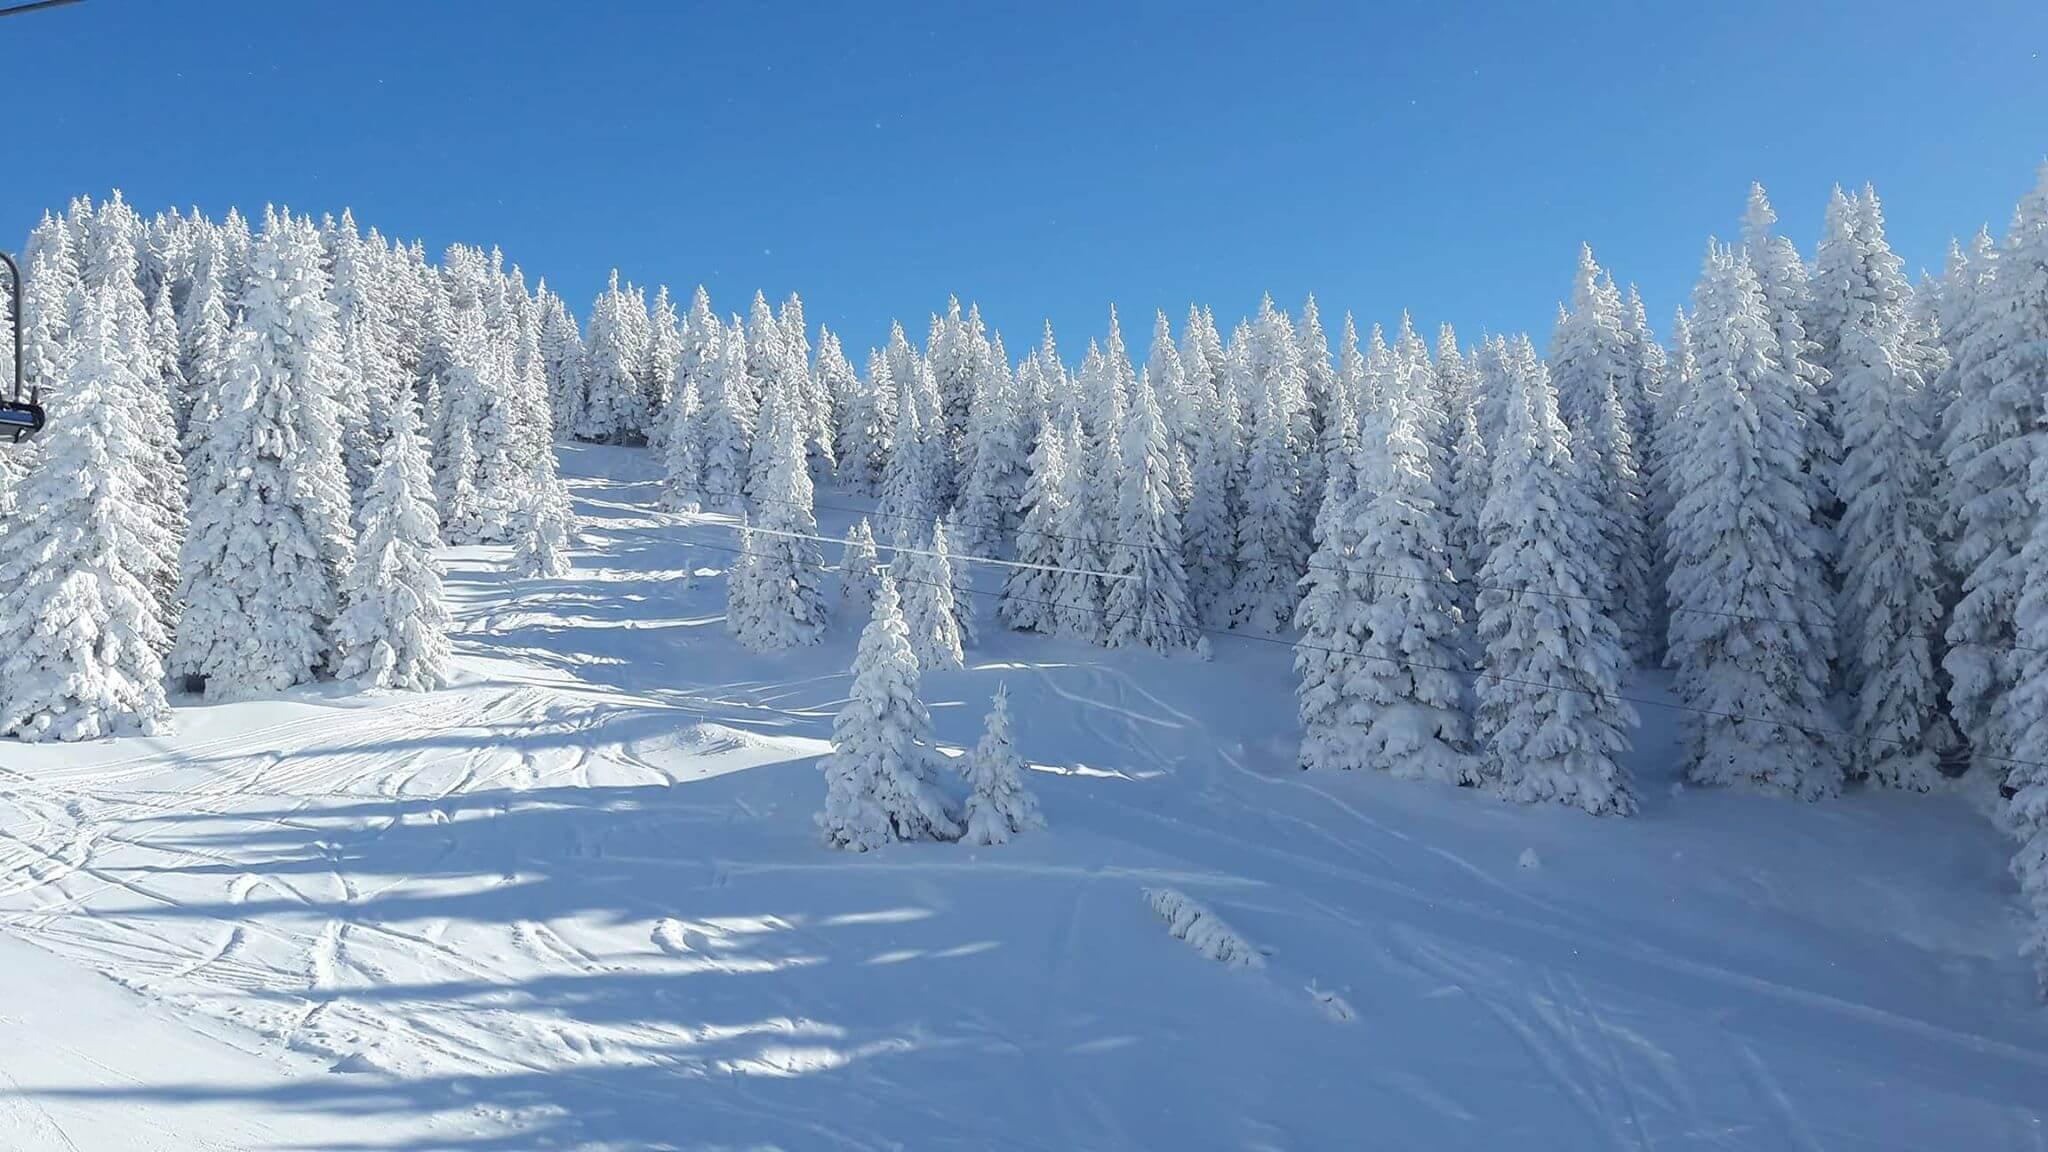 Snežna idila na Kopaoniku - 21. decembar 2017